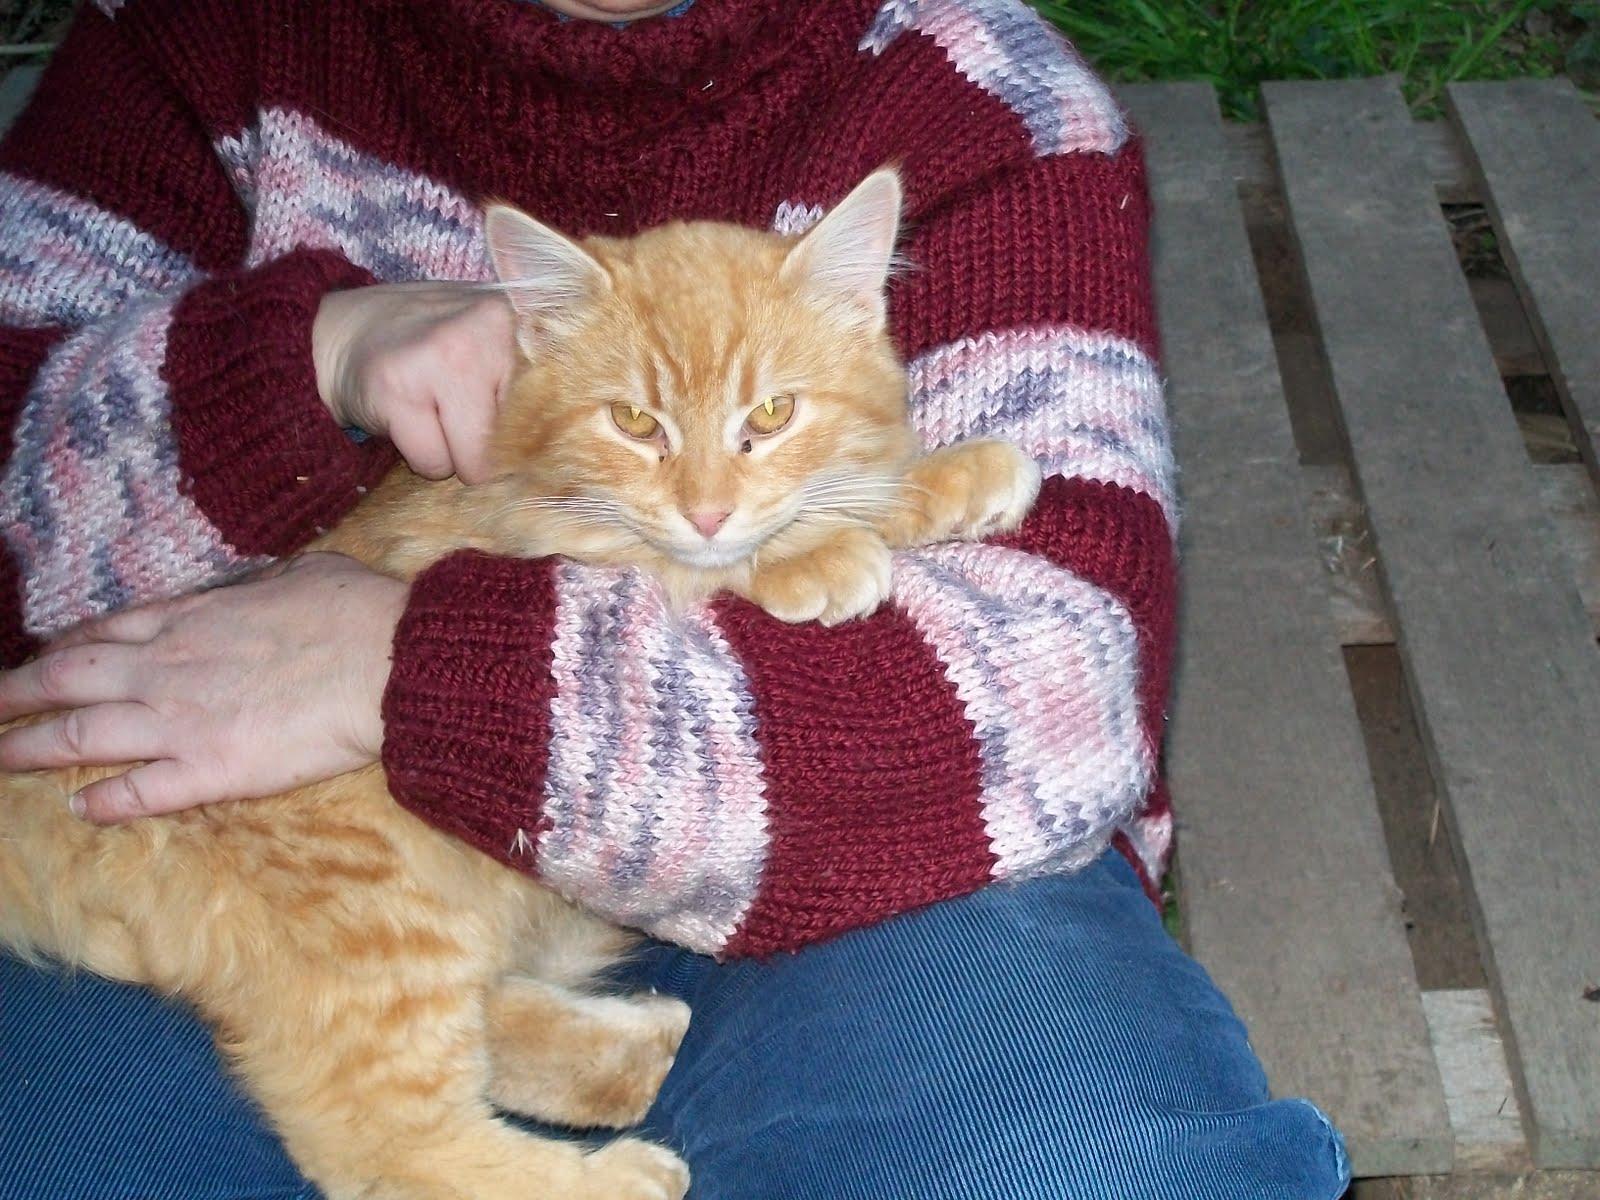 Adoptándonos: Dos hermosos gatitos rubios (macho y hembra) están en